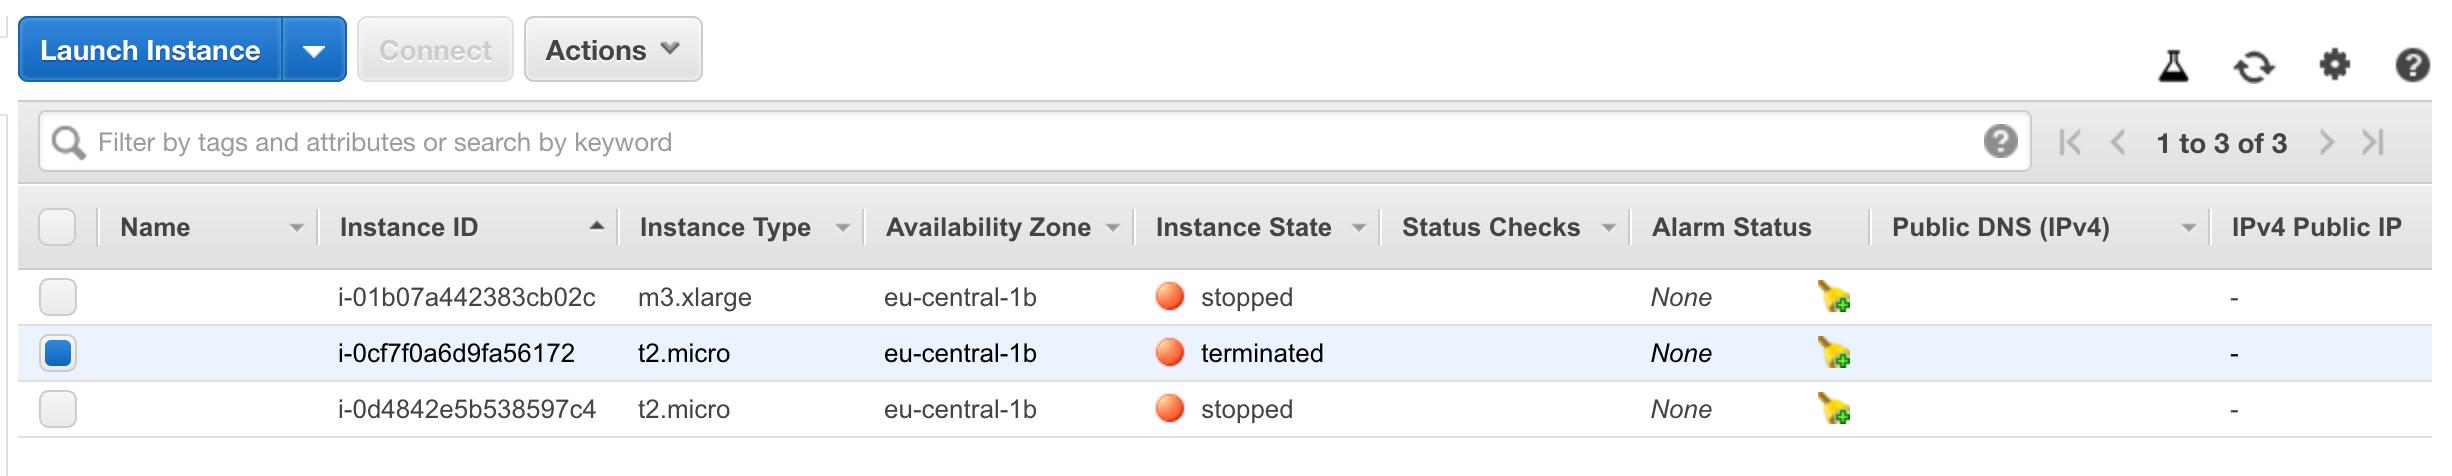 aws-ec2-management-console-instance-terminated